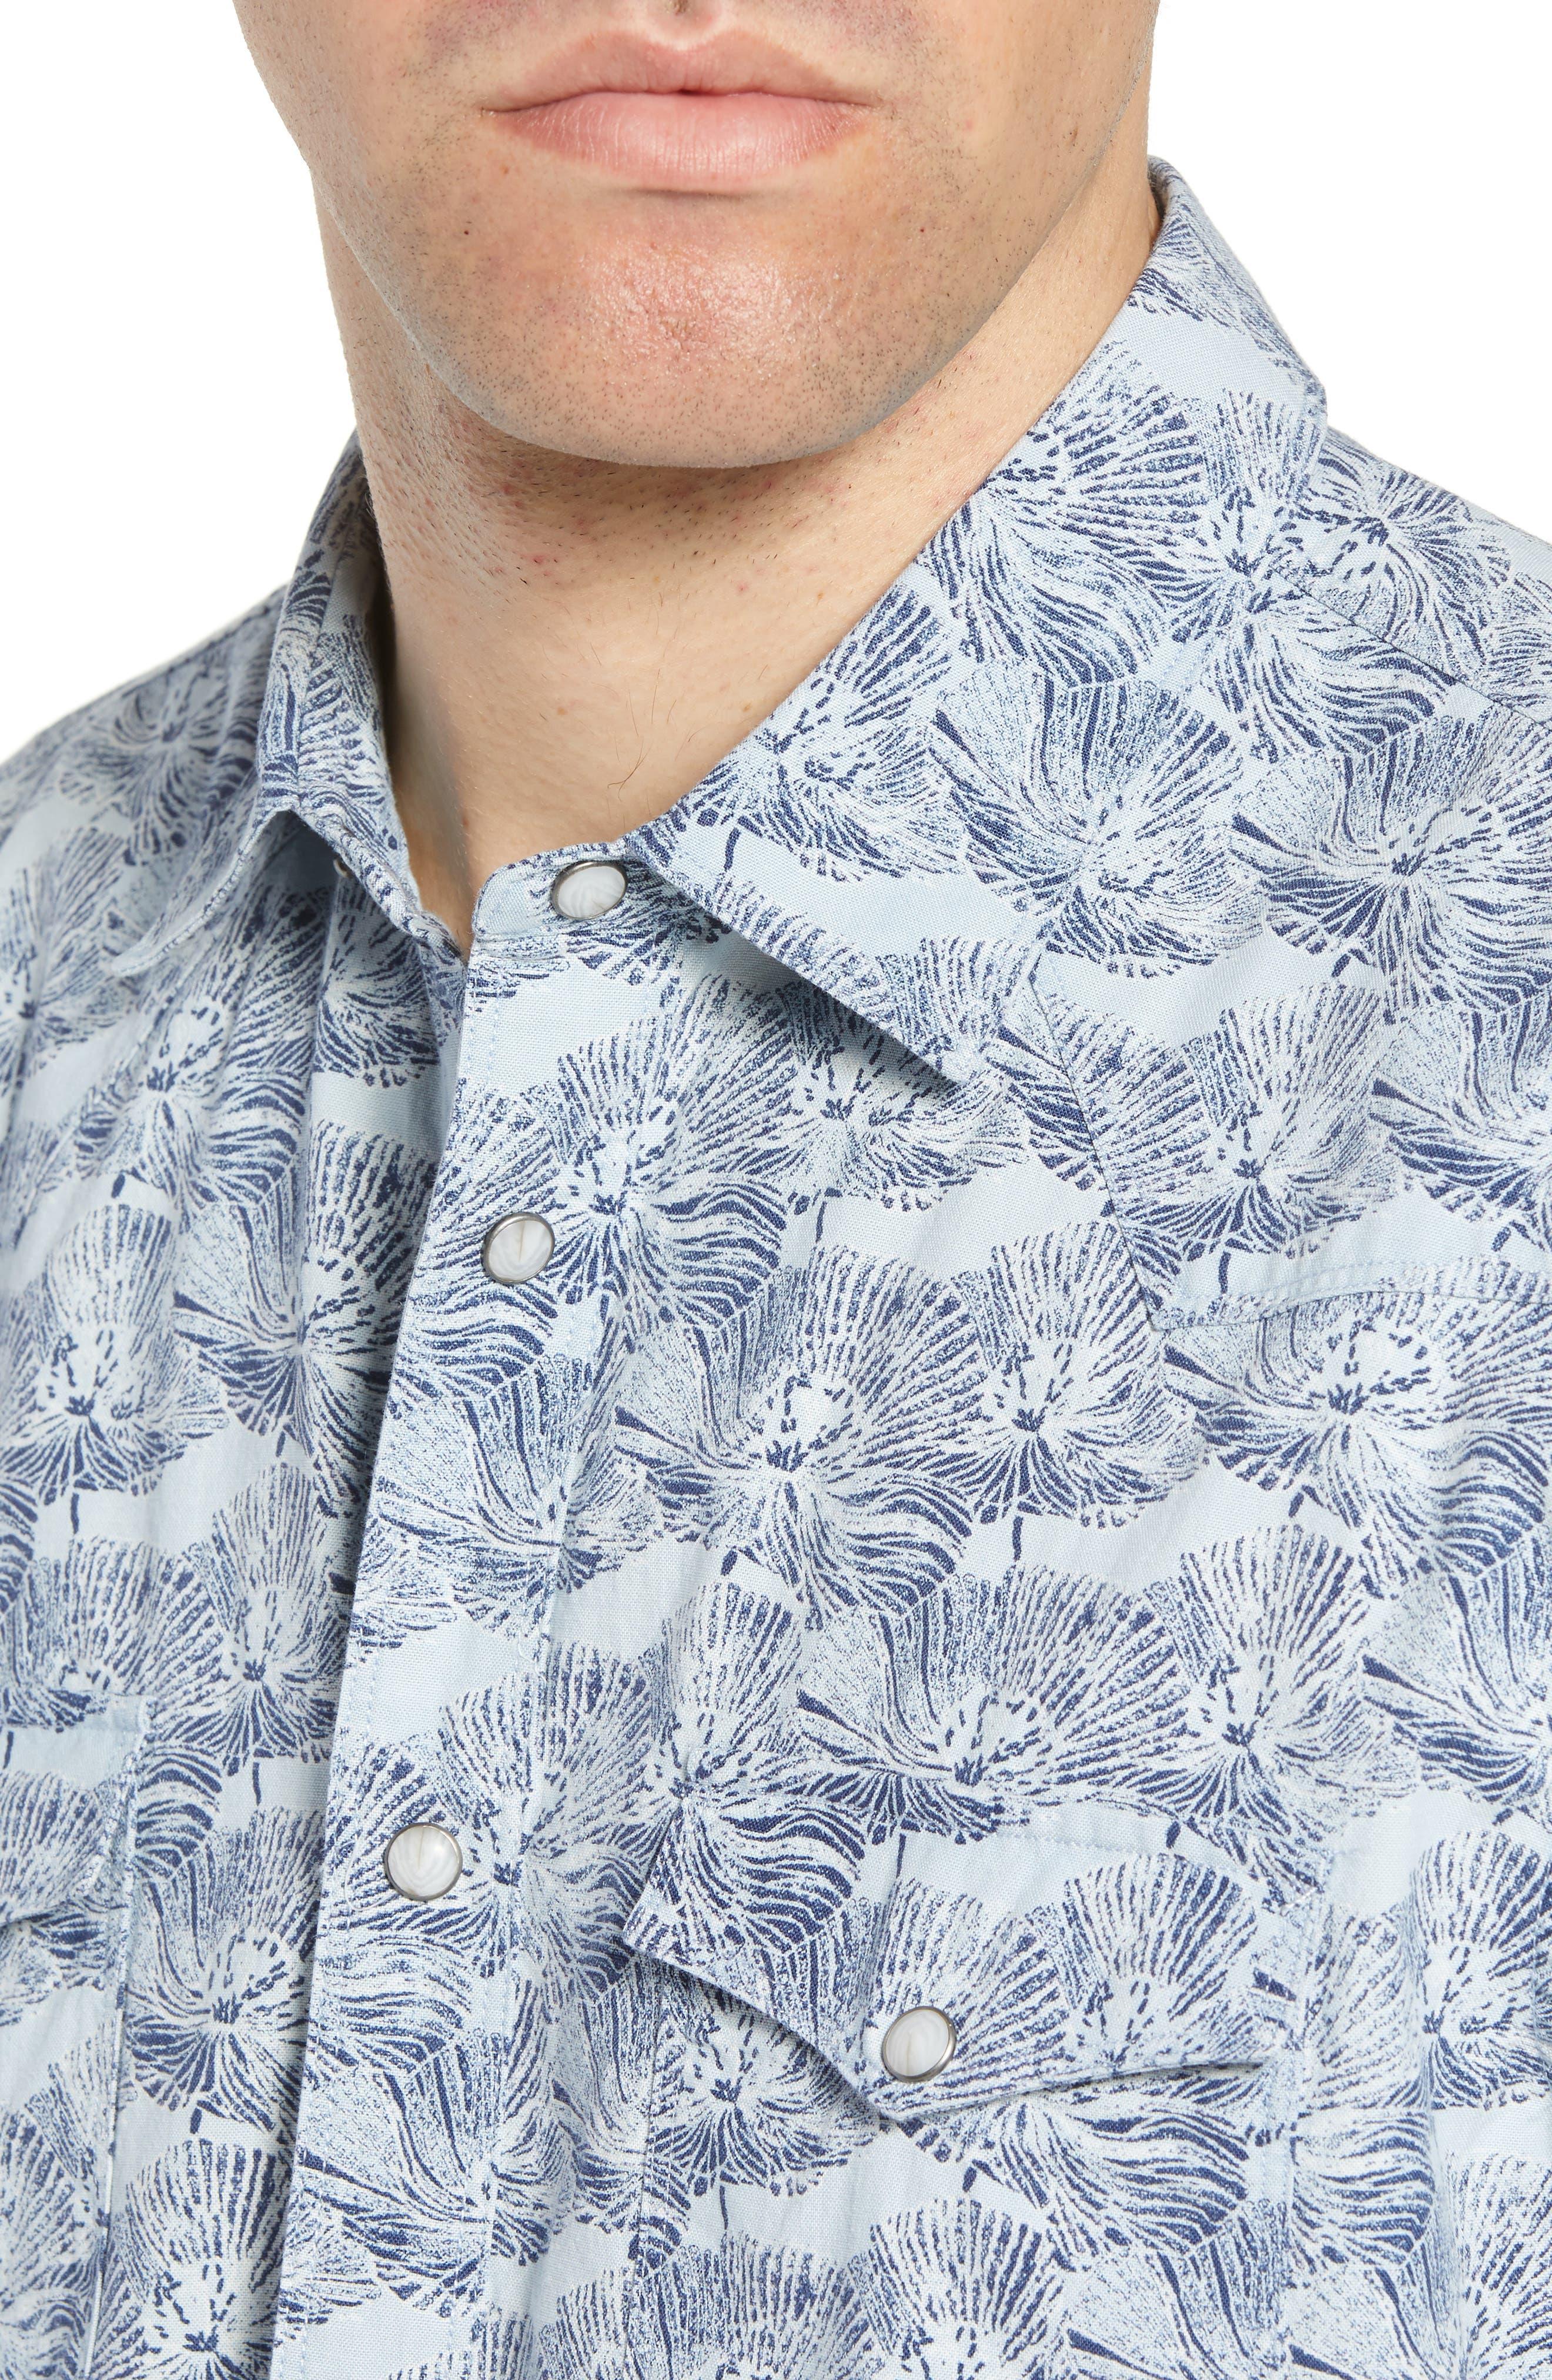 Zumas Vaquero Regular Fit Floral Sport Shirt,                             Alternate thumbnail 4, color,                             INDIGO